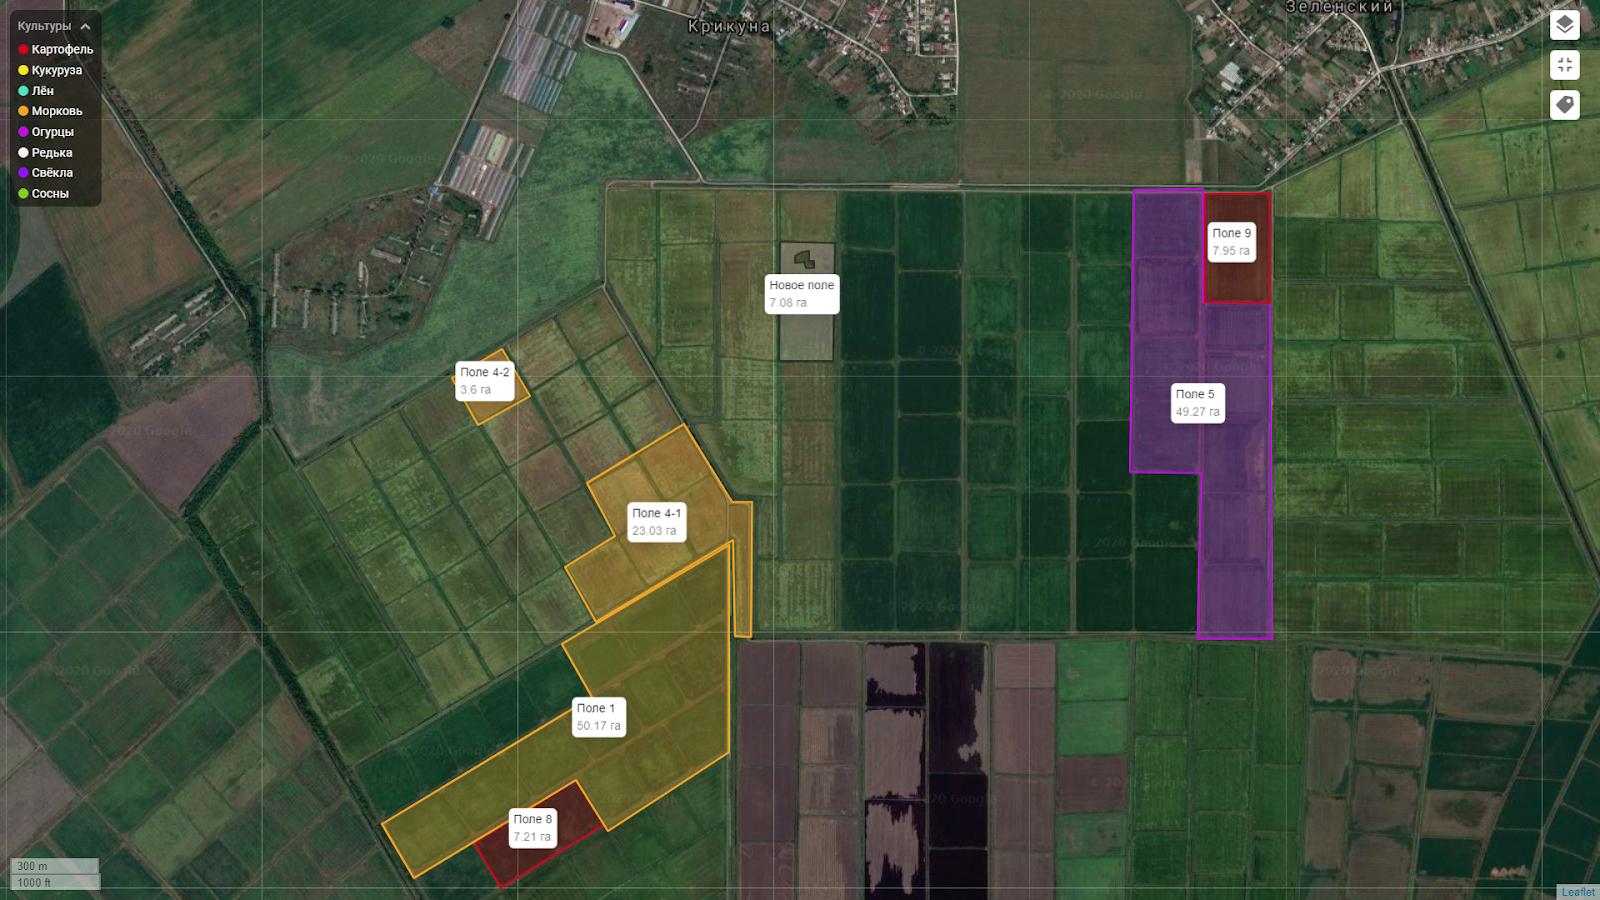 Отображение площади полей на карте